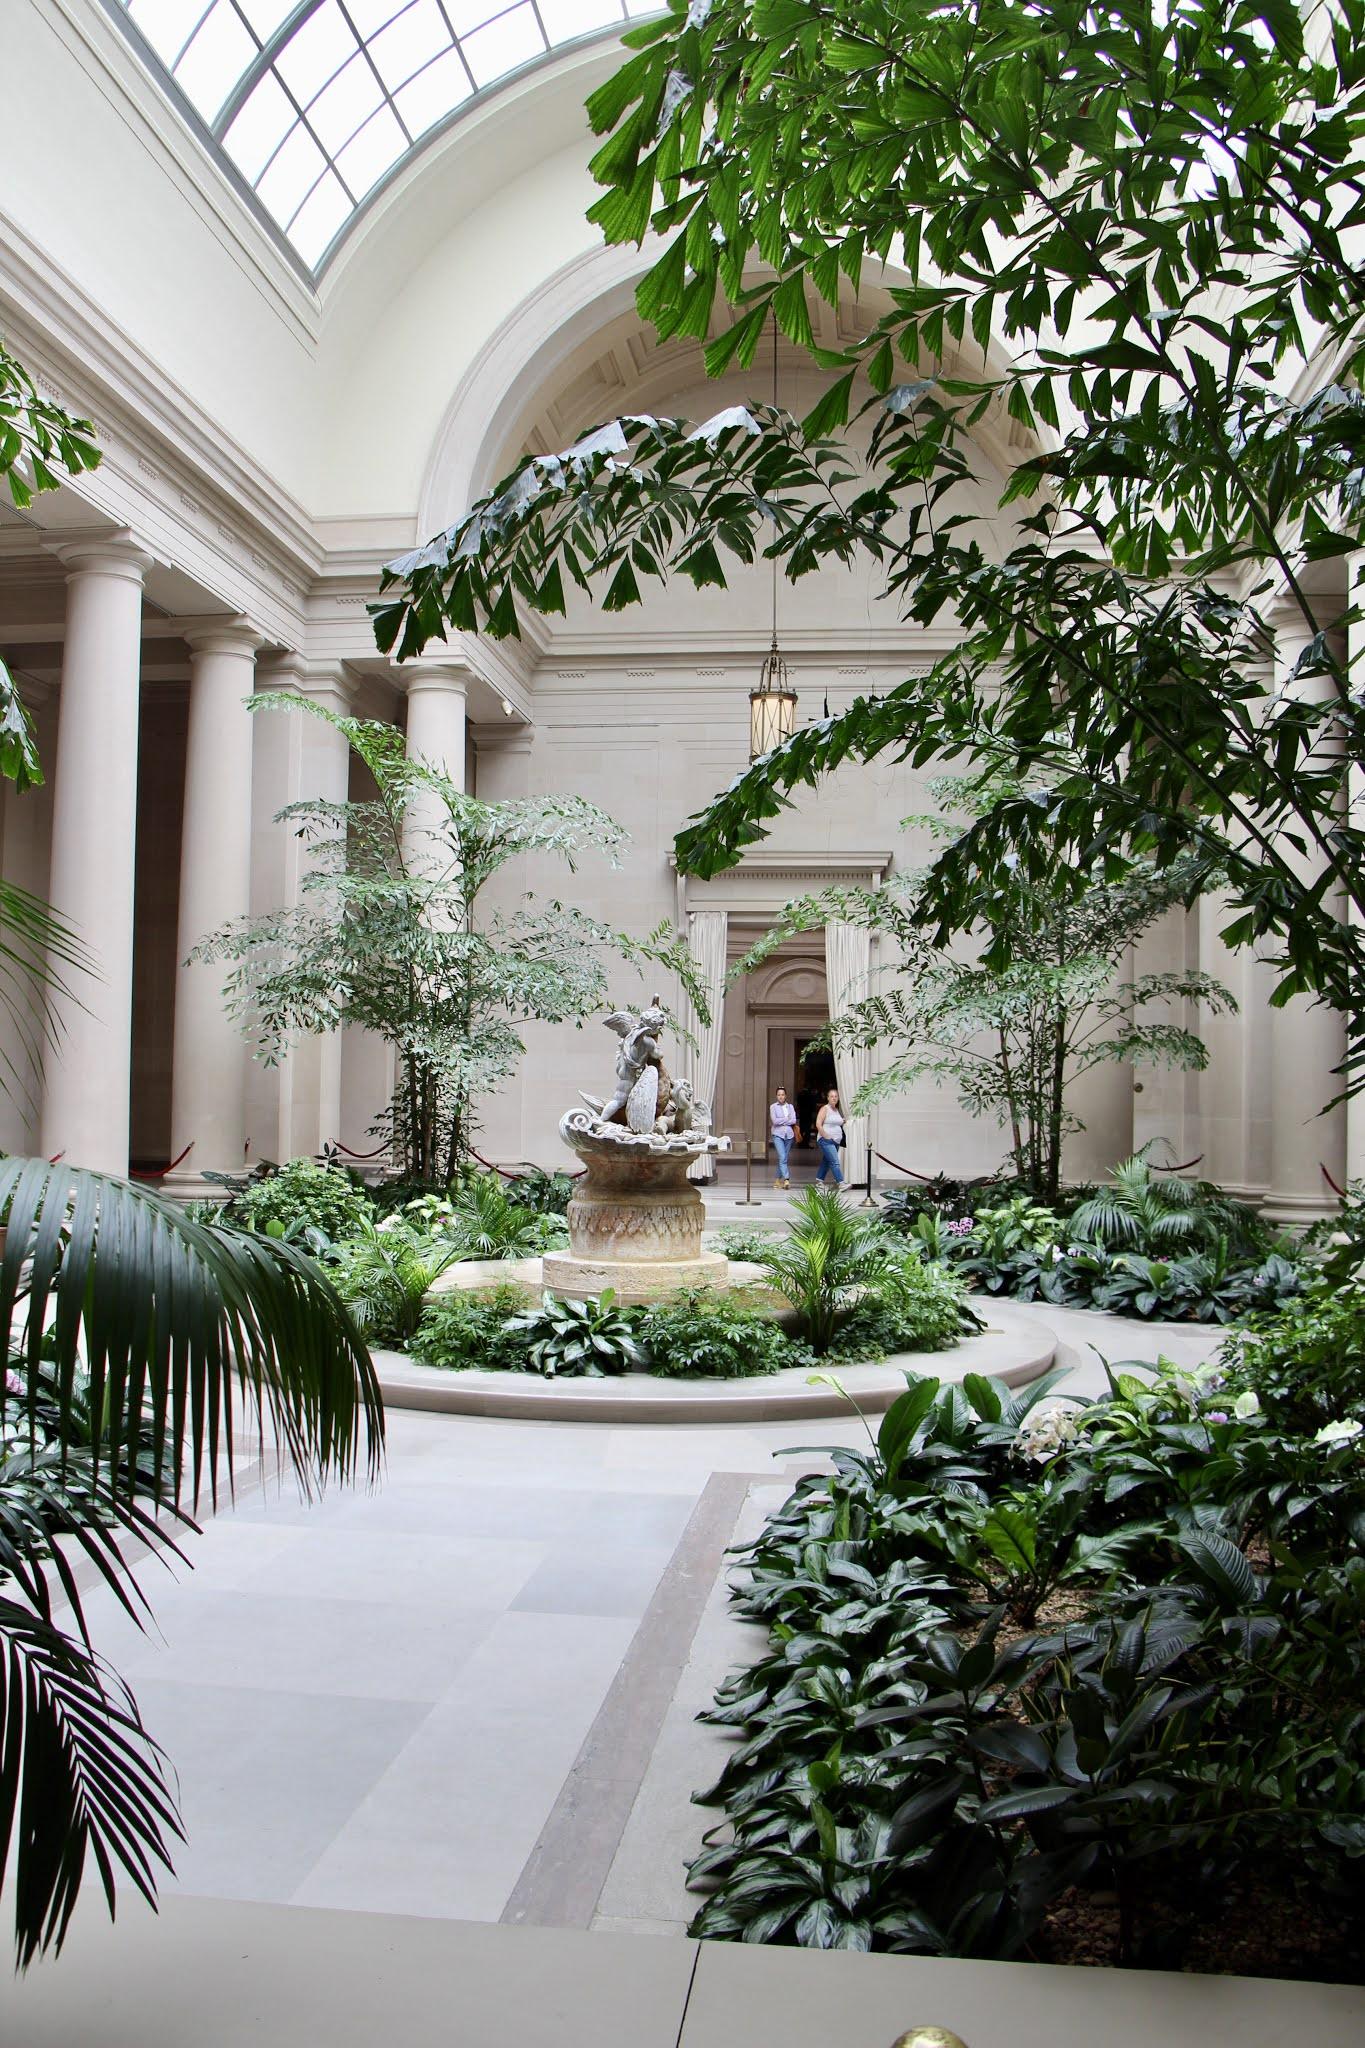 Washington dc, travel guide, art museum